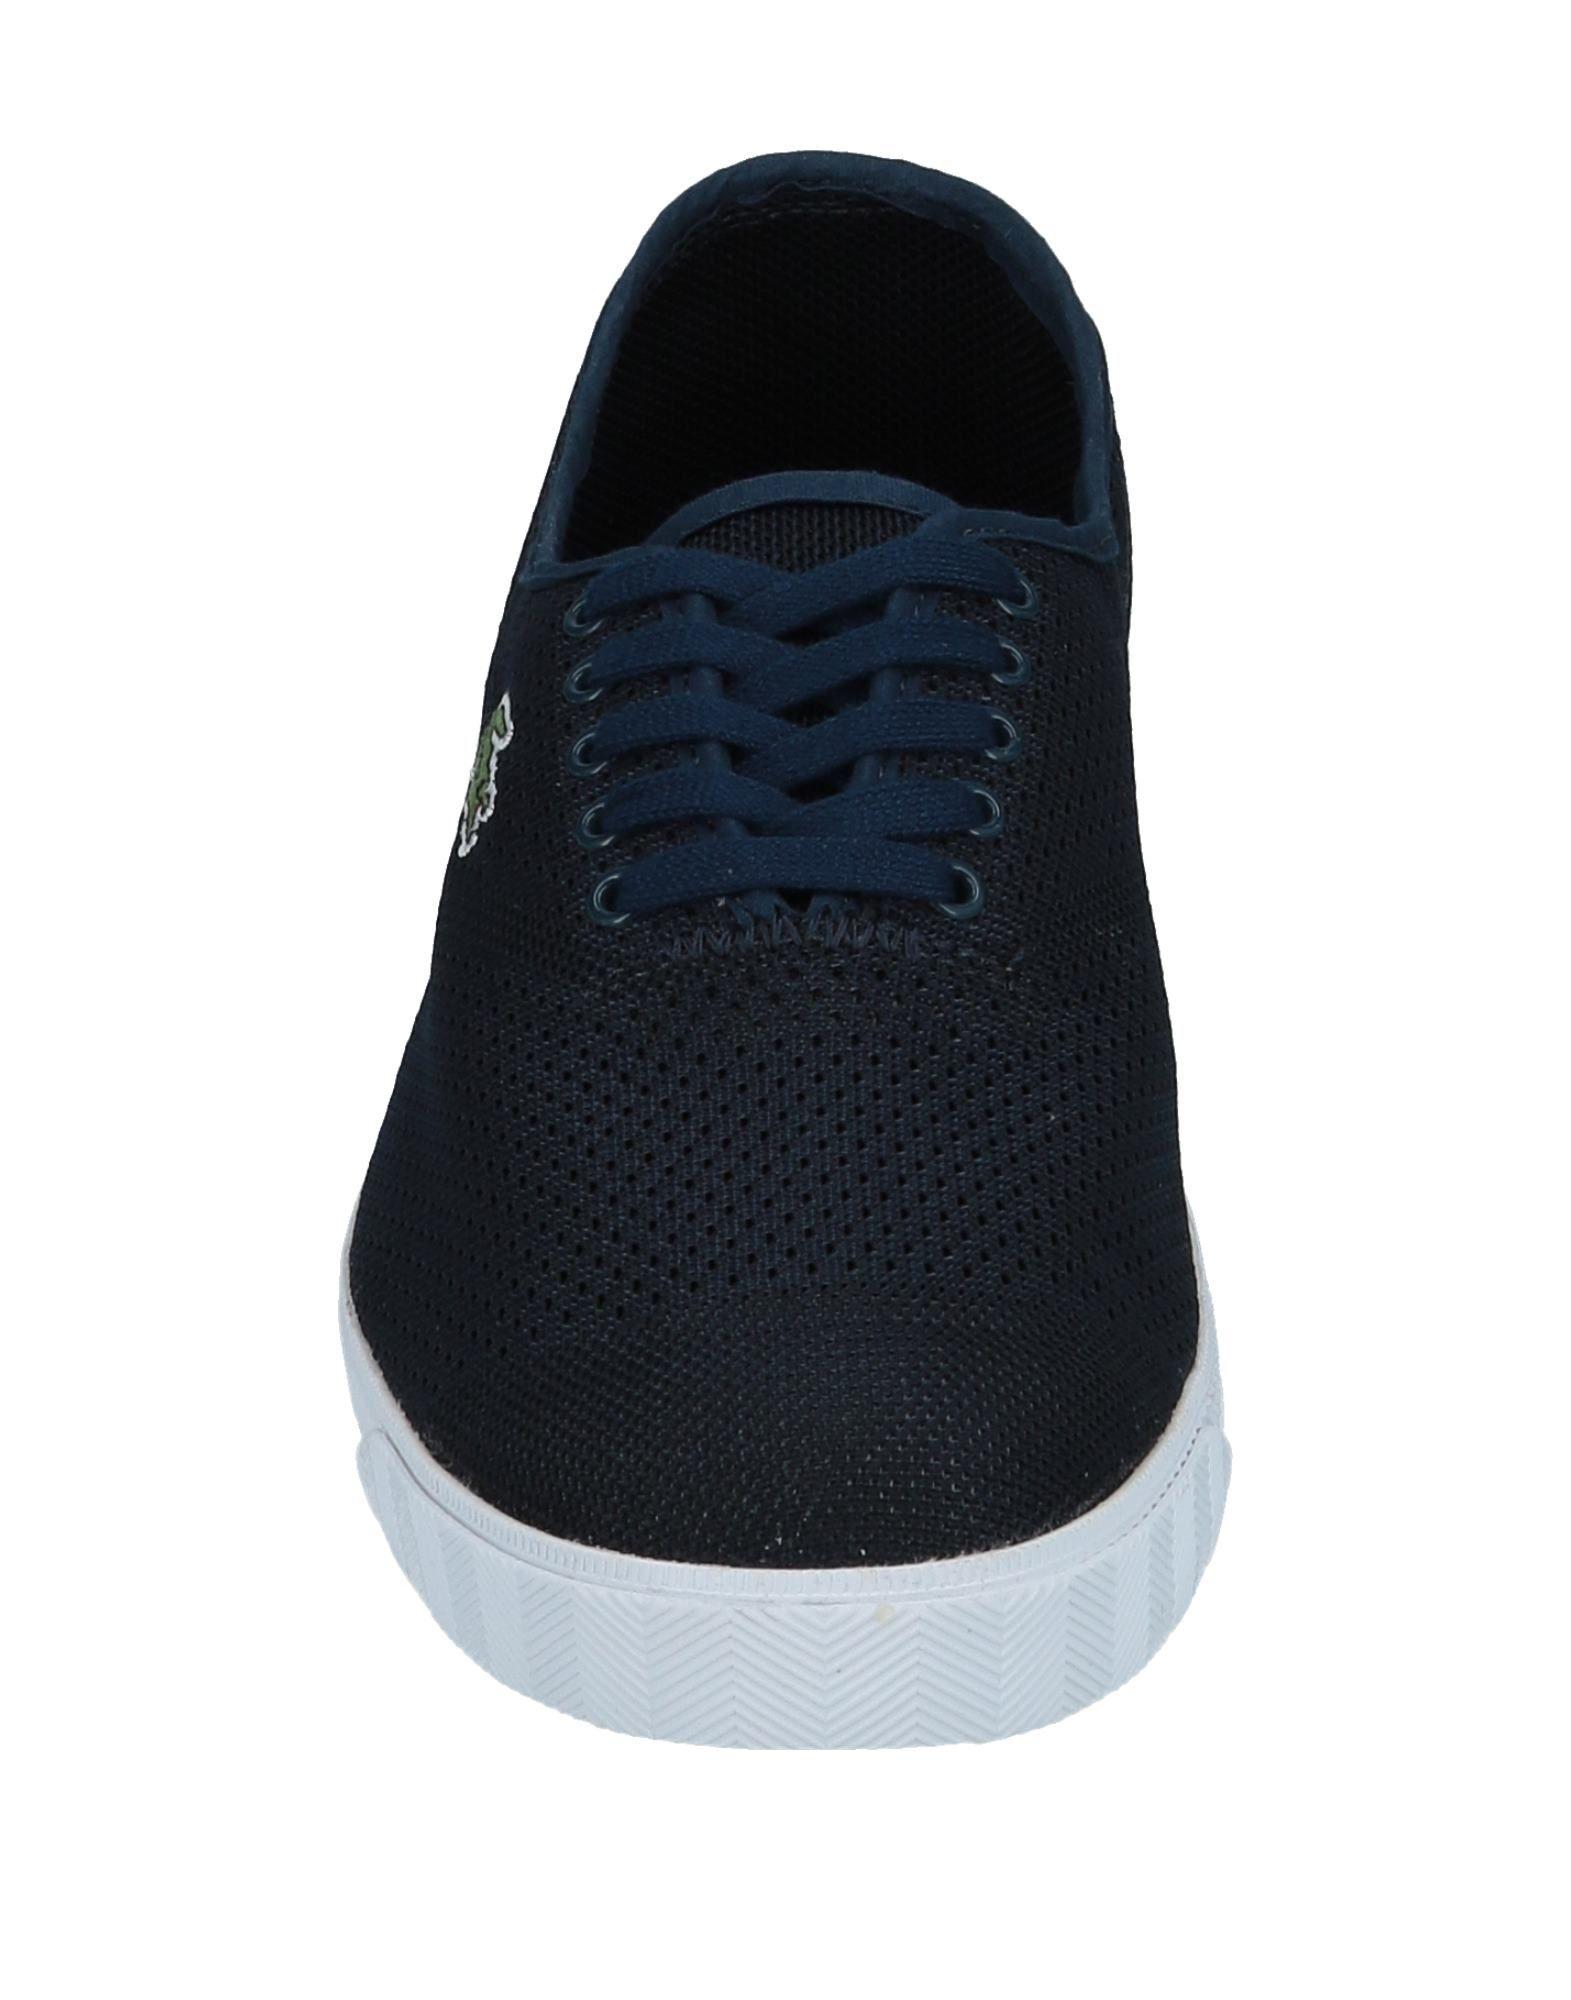 Sneakers Lacoste Sport Uomo Uomo Uomo - 11546667FN a8043e